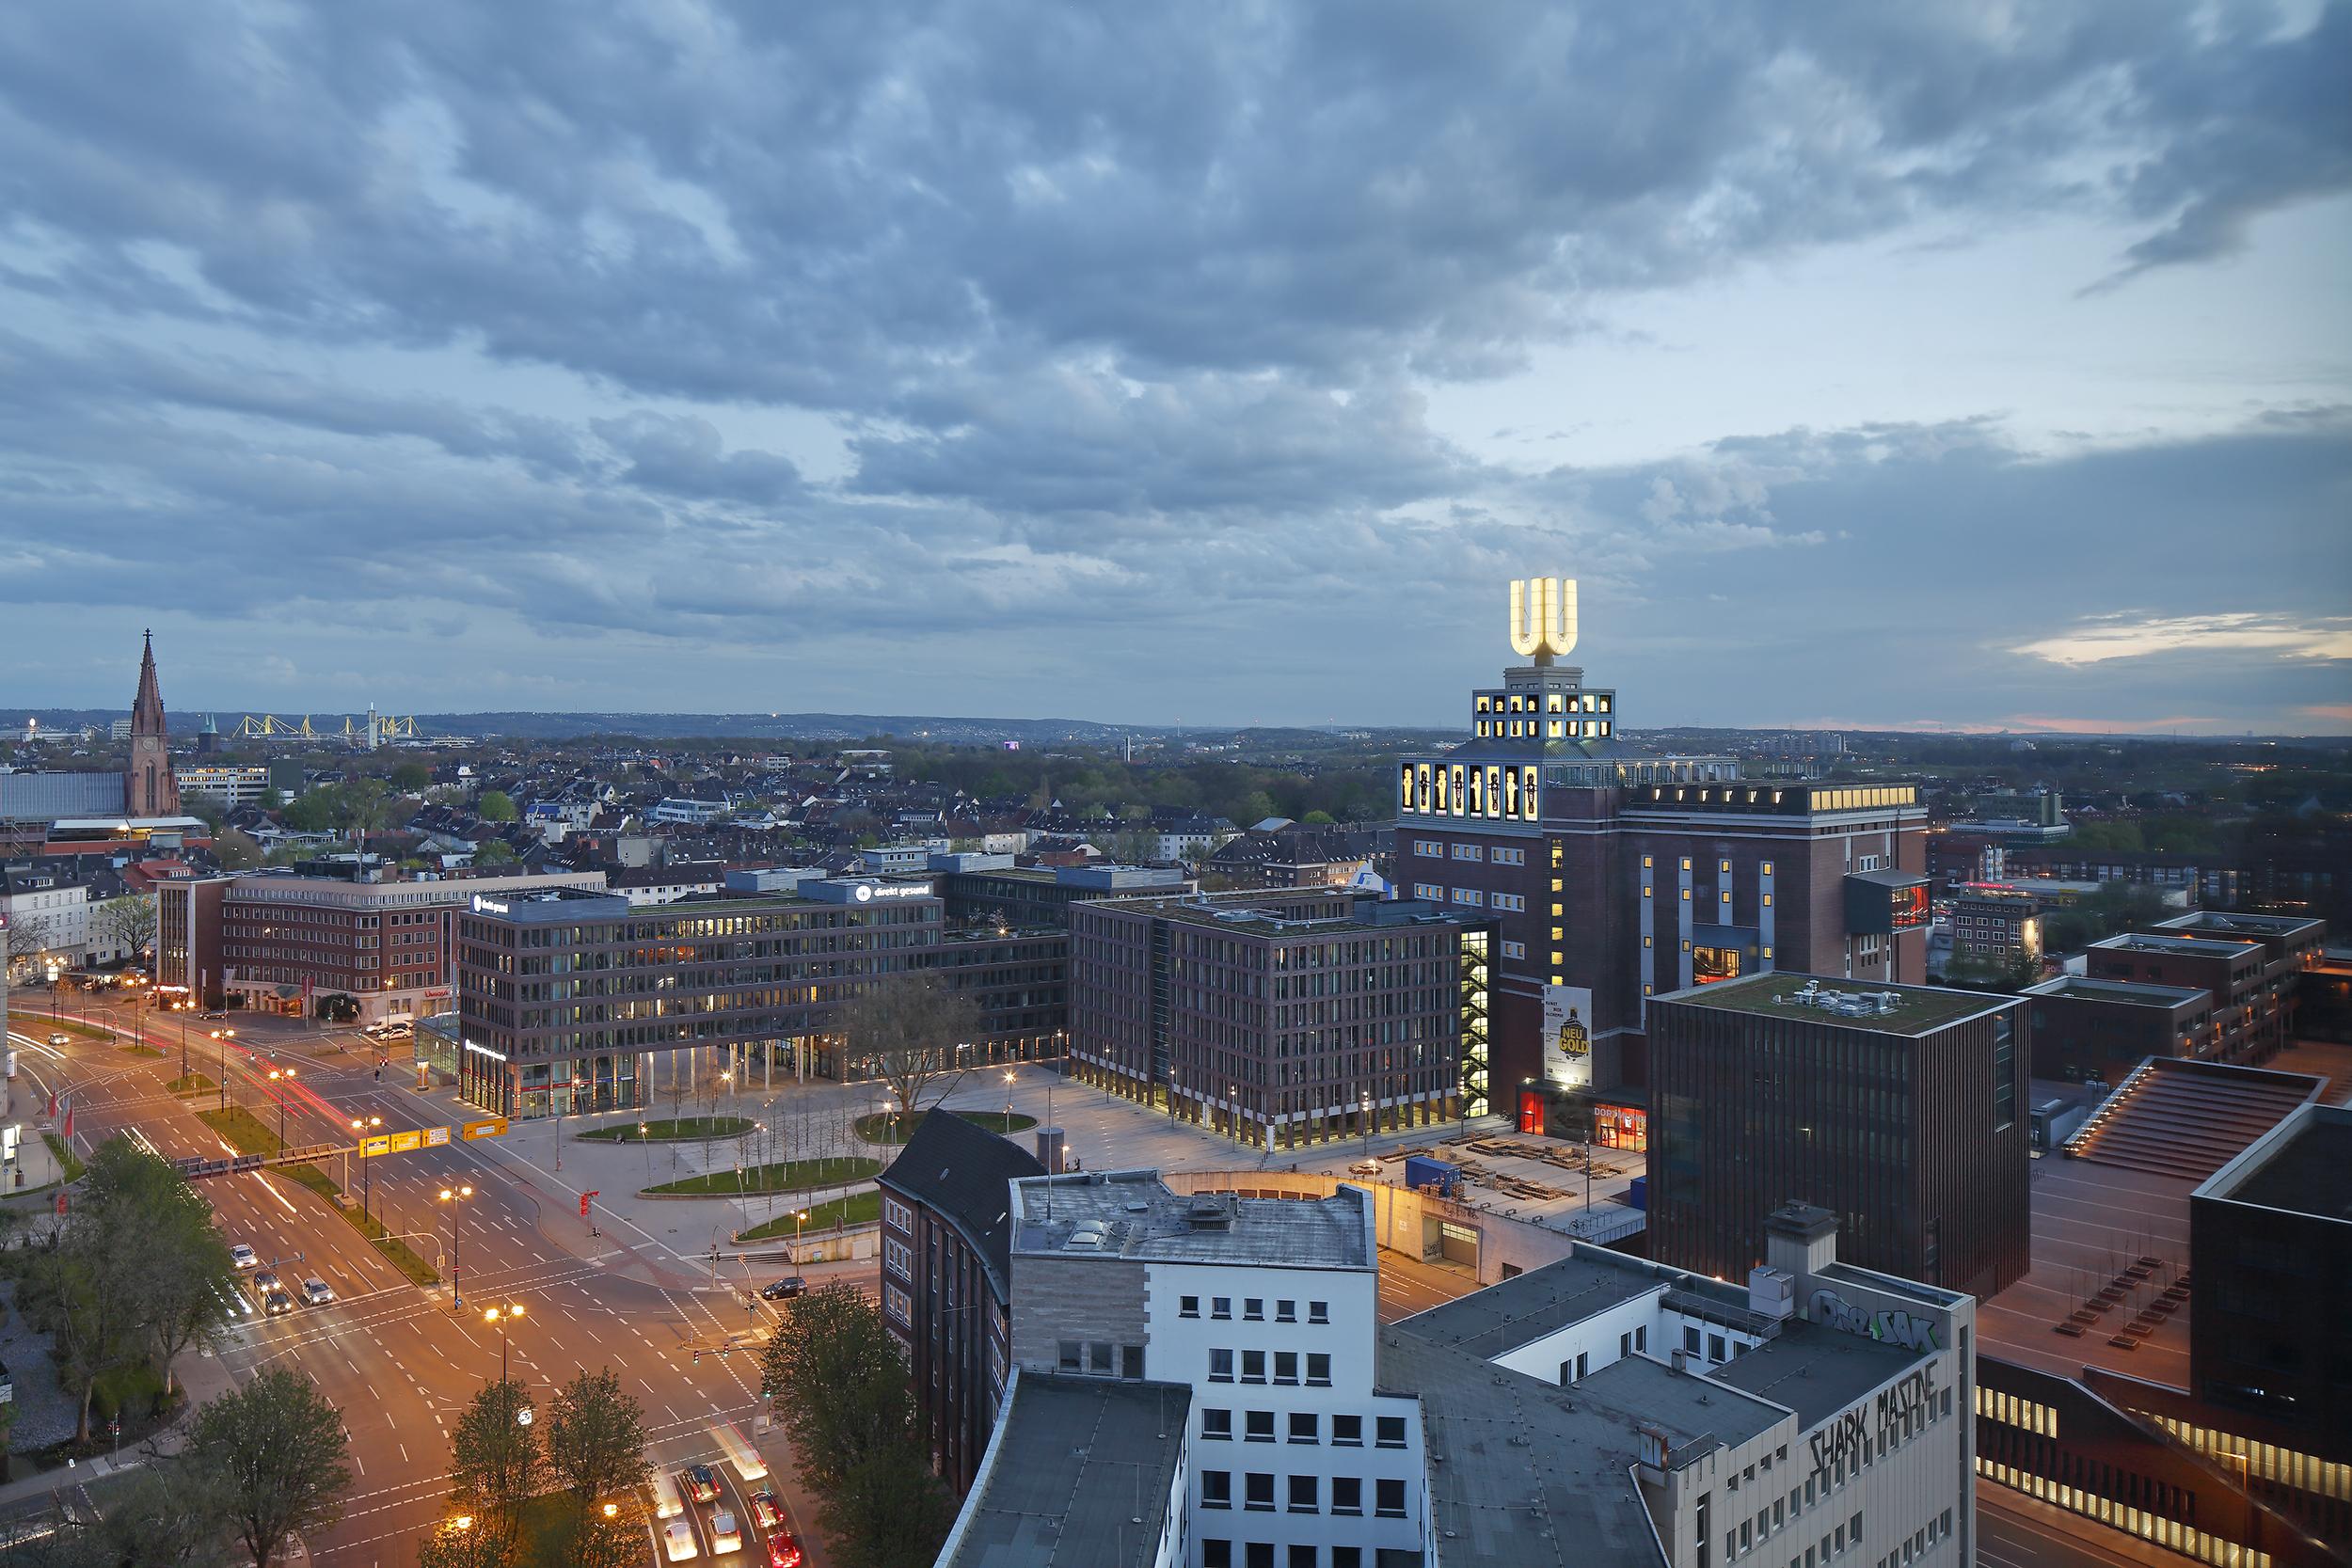 Dortmunder U U2013 Landmark Viewpoint And Culture In Dortmund